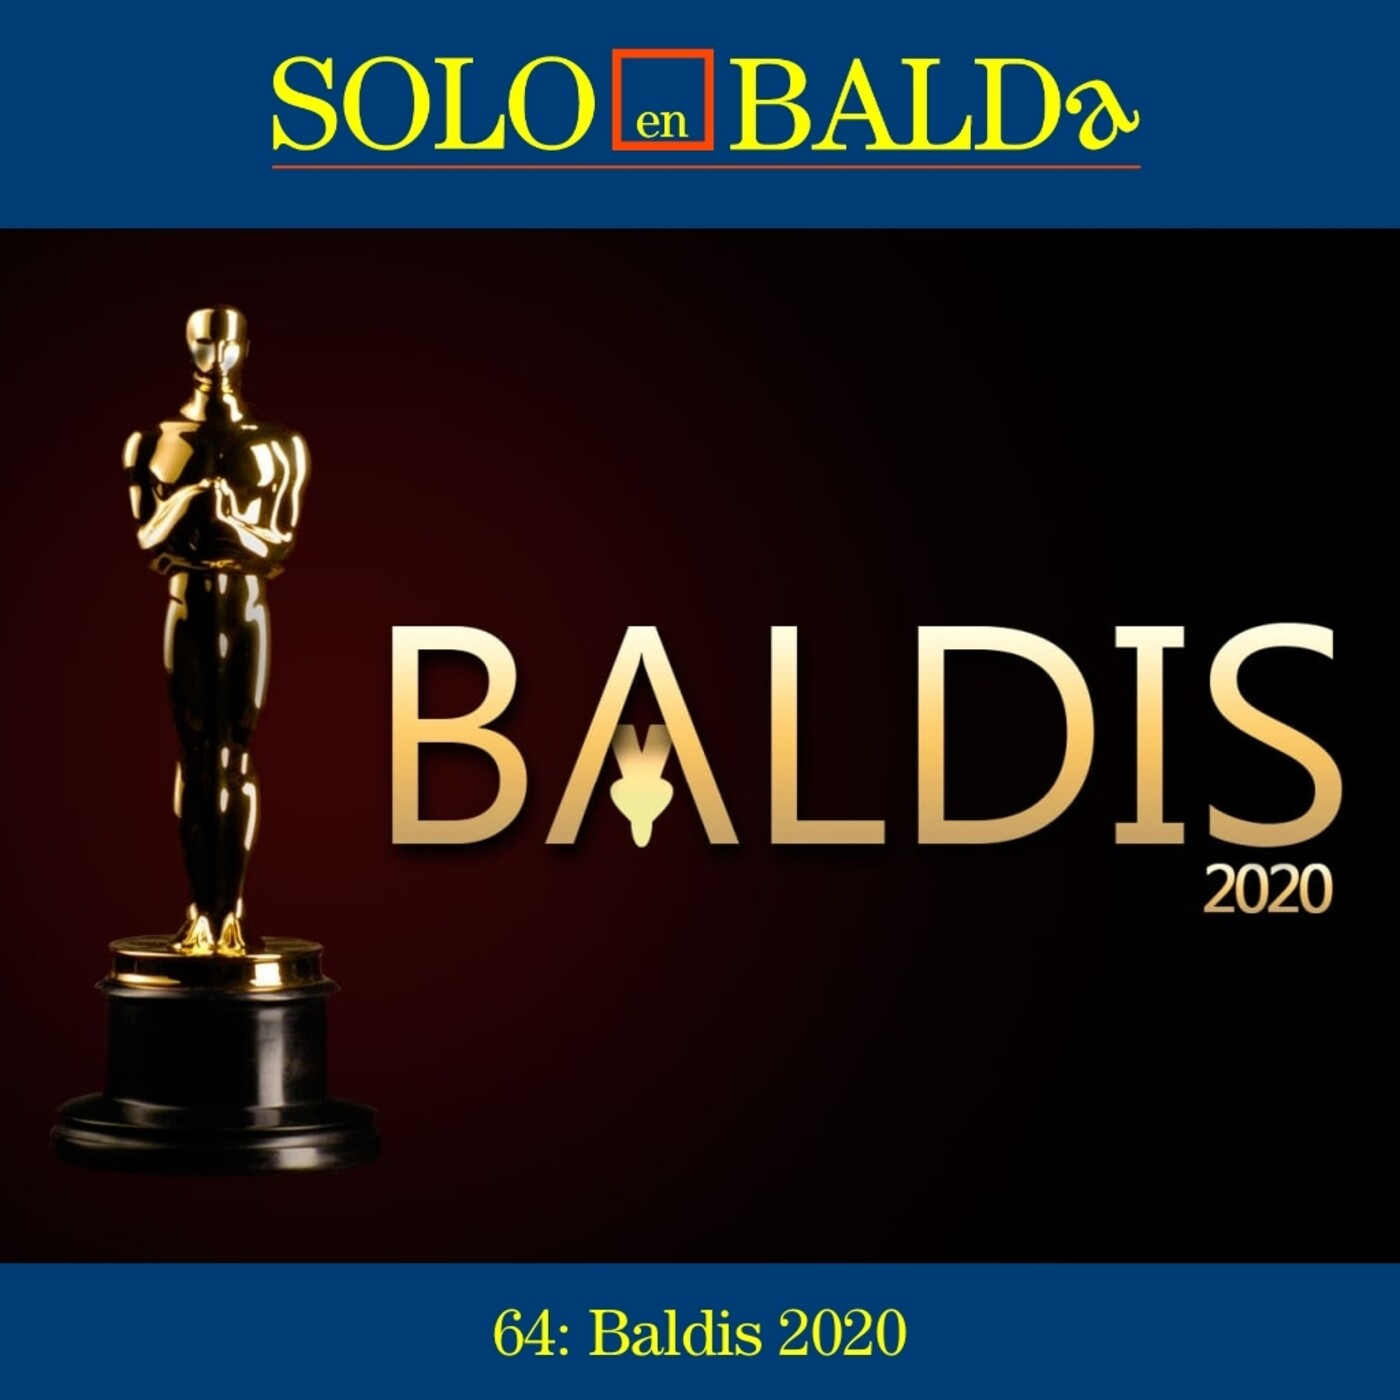 64: Baldis 2020